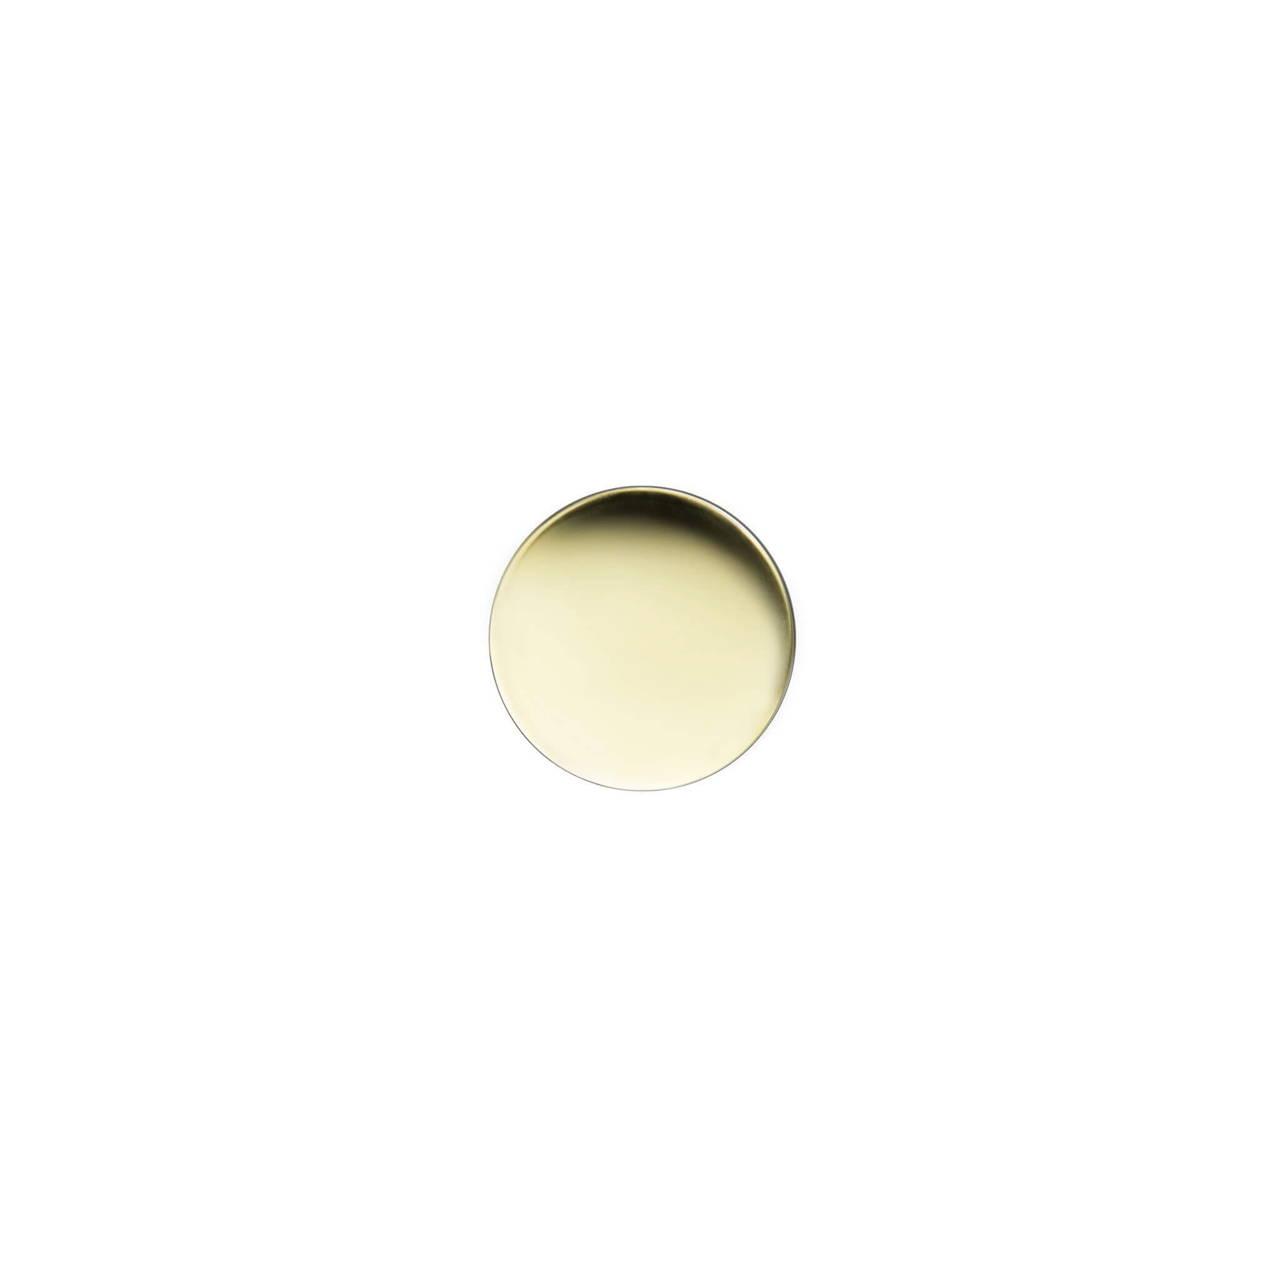 Polished Brass Cufflink top face